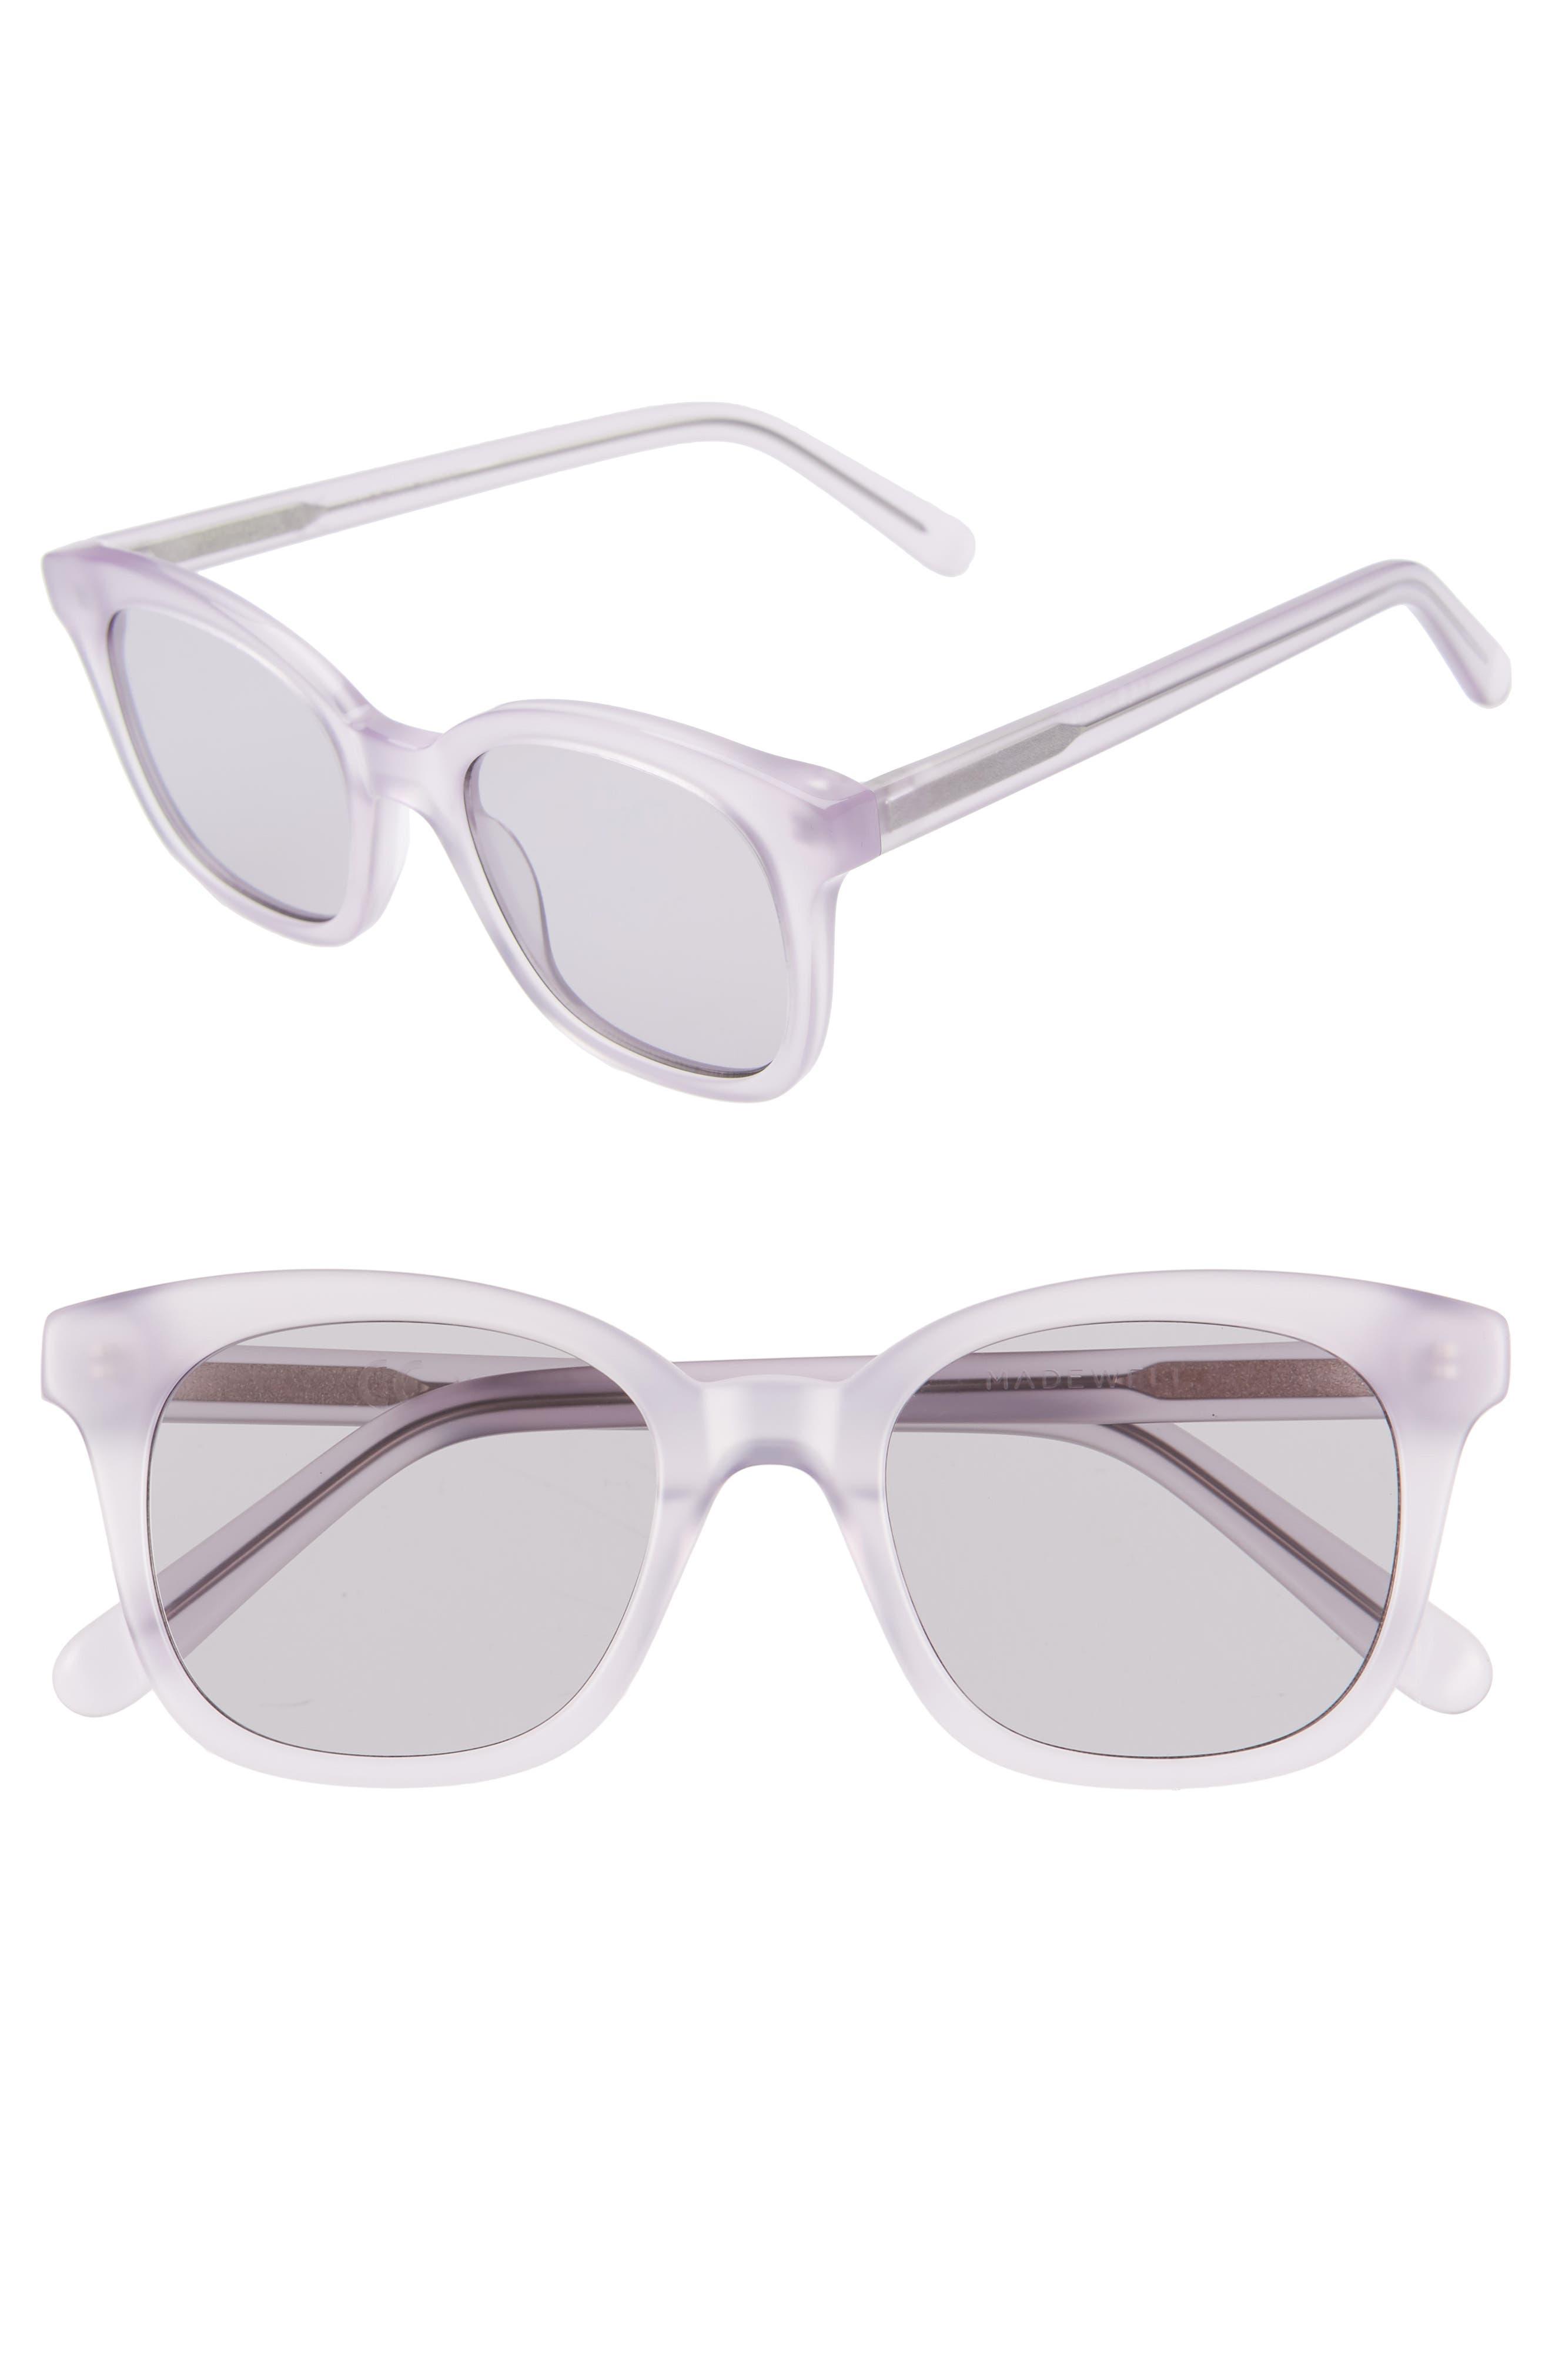 Madewell Venice 4m Flat Frame Sunglasses -